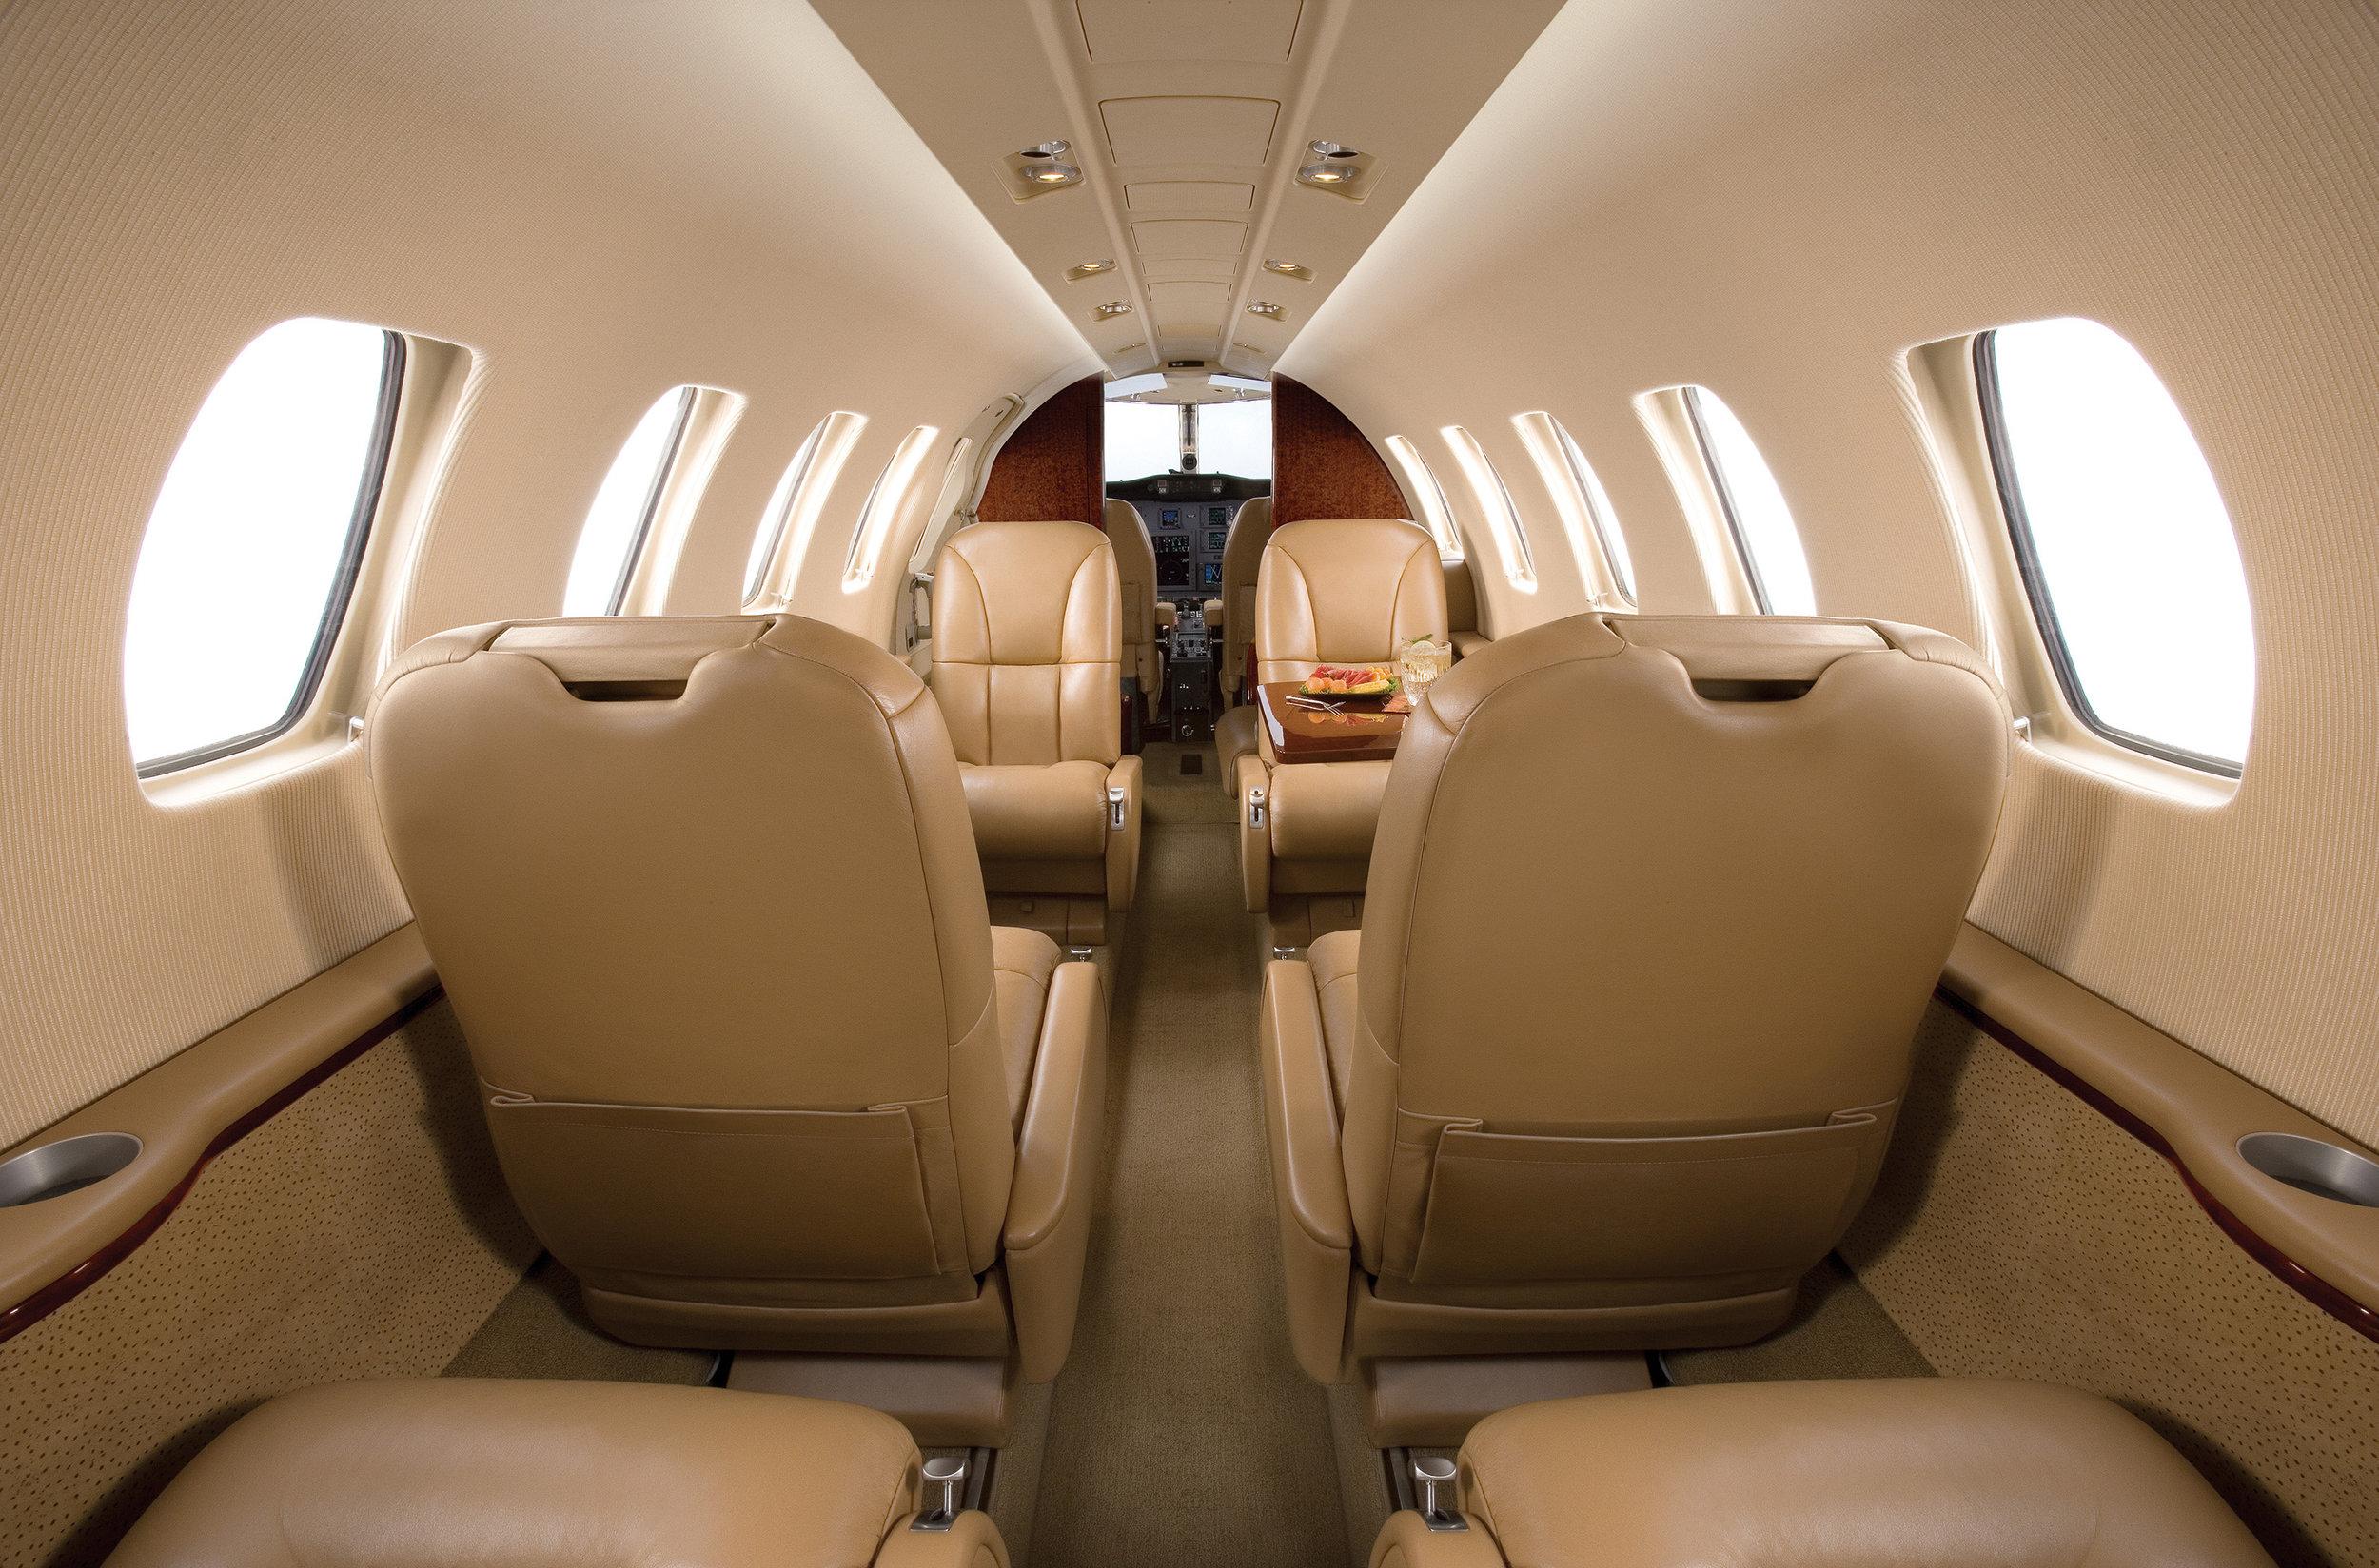 Cessna_CJ2_interior_Light-Jet_Legacy_Aviation_Private_Jet_NetJets_jet_charter_TEB_VNY_MIA_PBI_FRG_SFO_FLL_FXE_BED.jpg